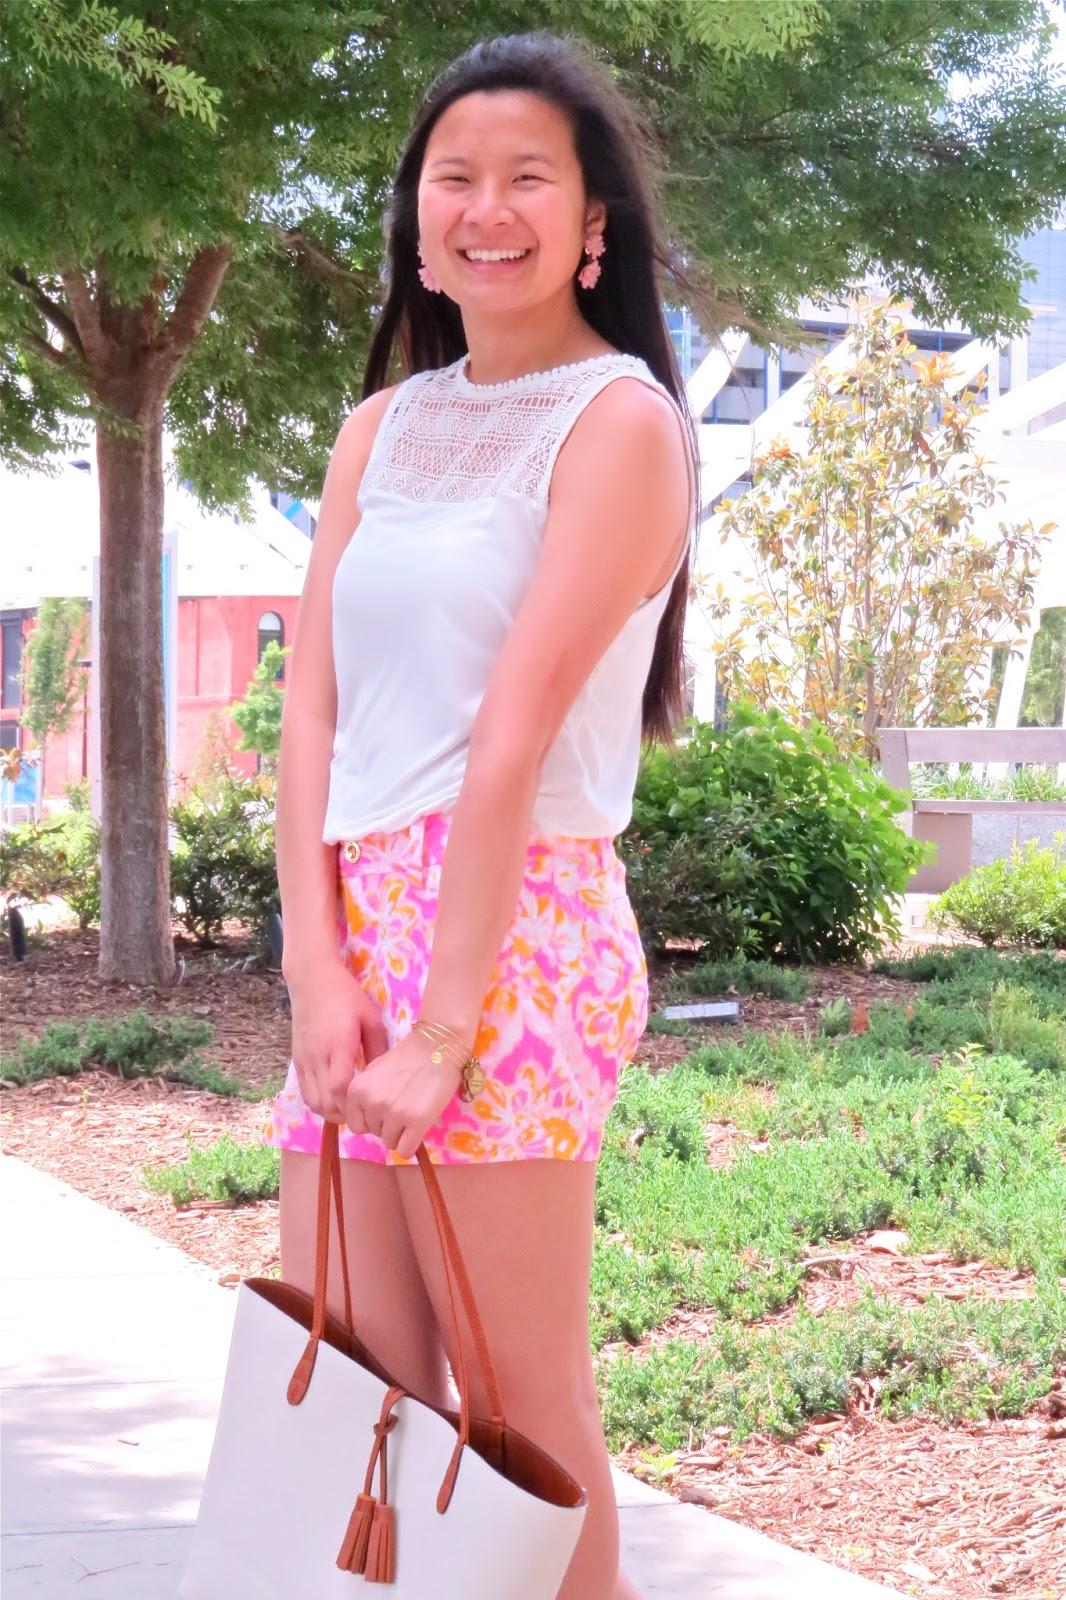 Lilly_Pulitzer_shorts